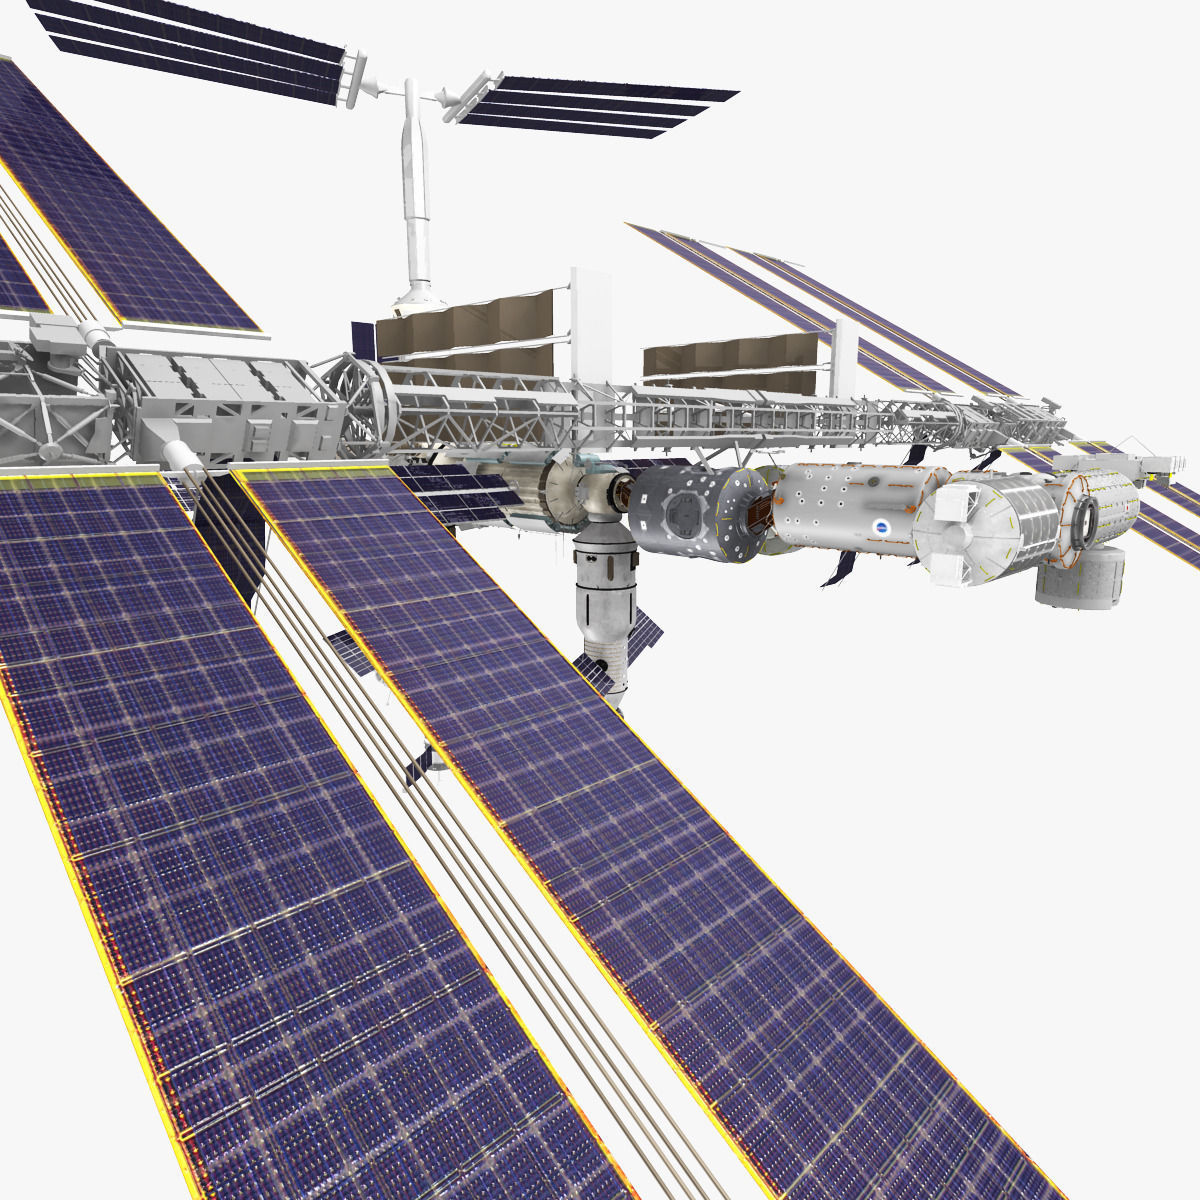 3d model international space station - photo #31